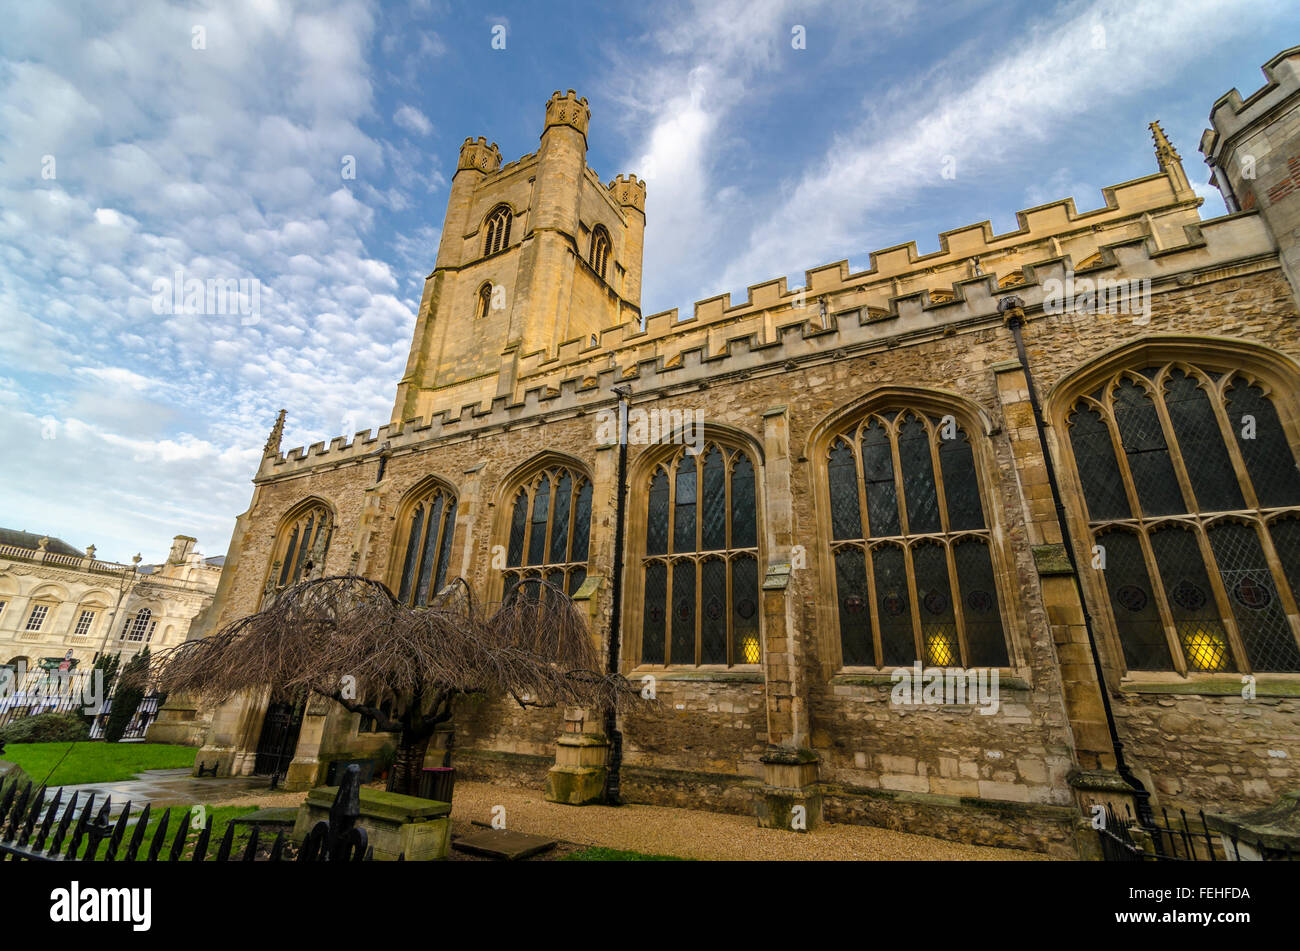 Great St Mary's Church, Cambridge, UK - 1519 - Stock Image